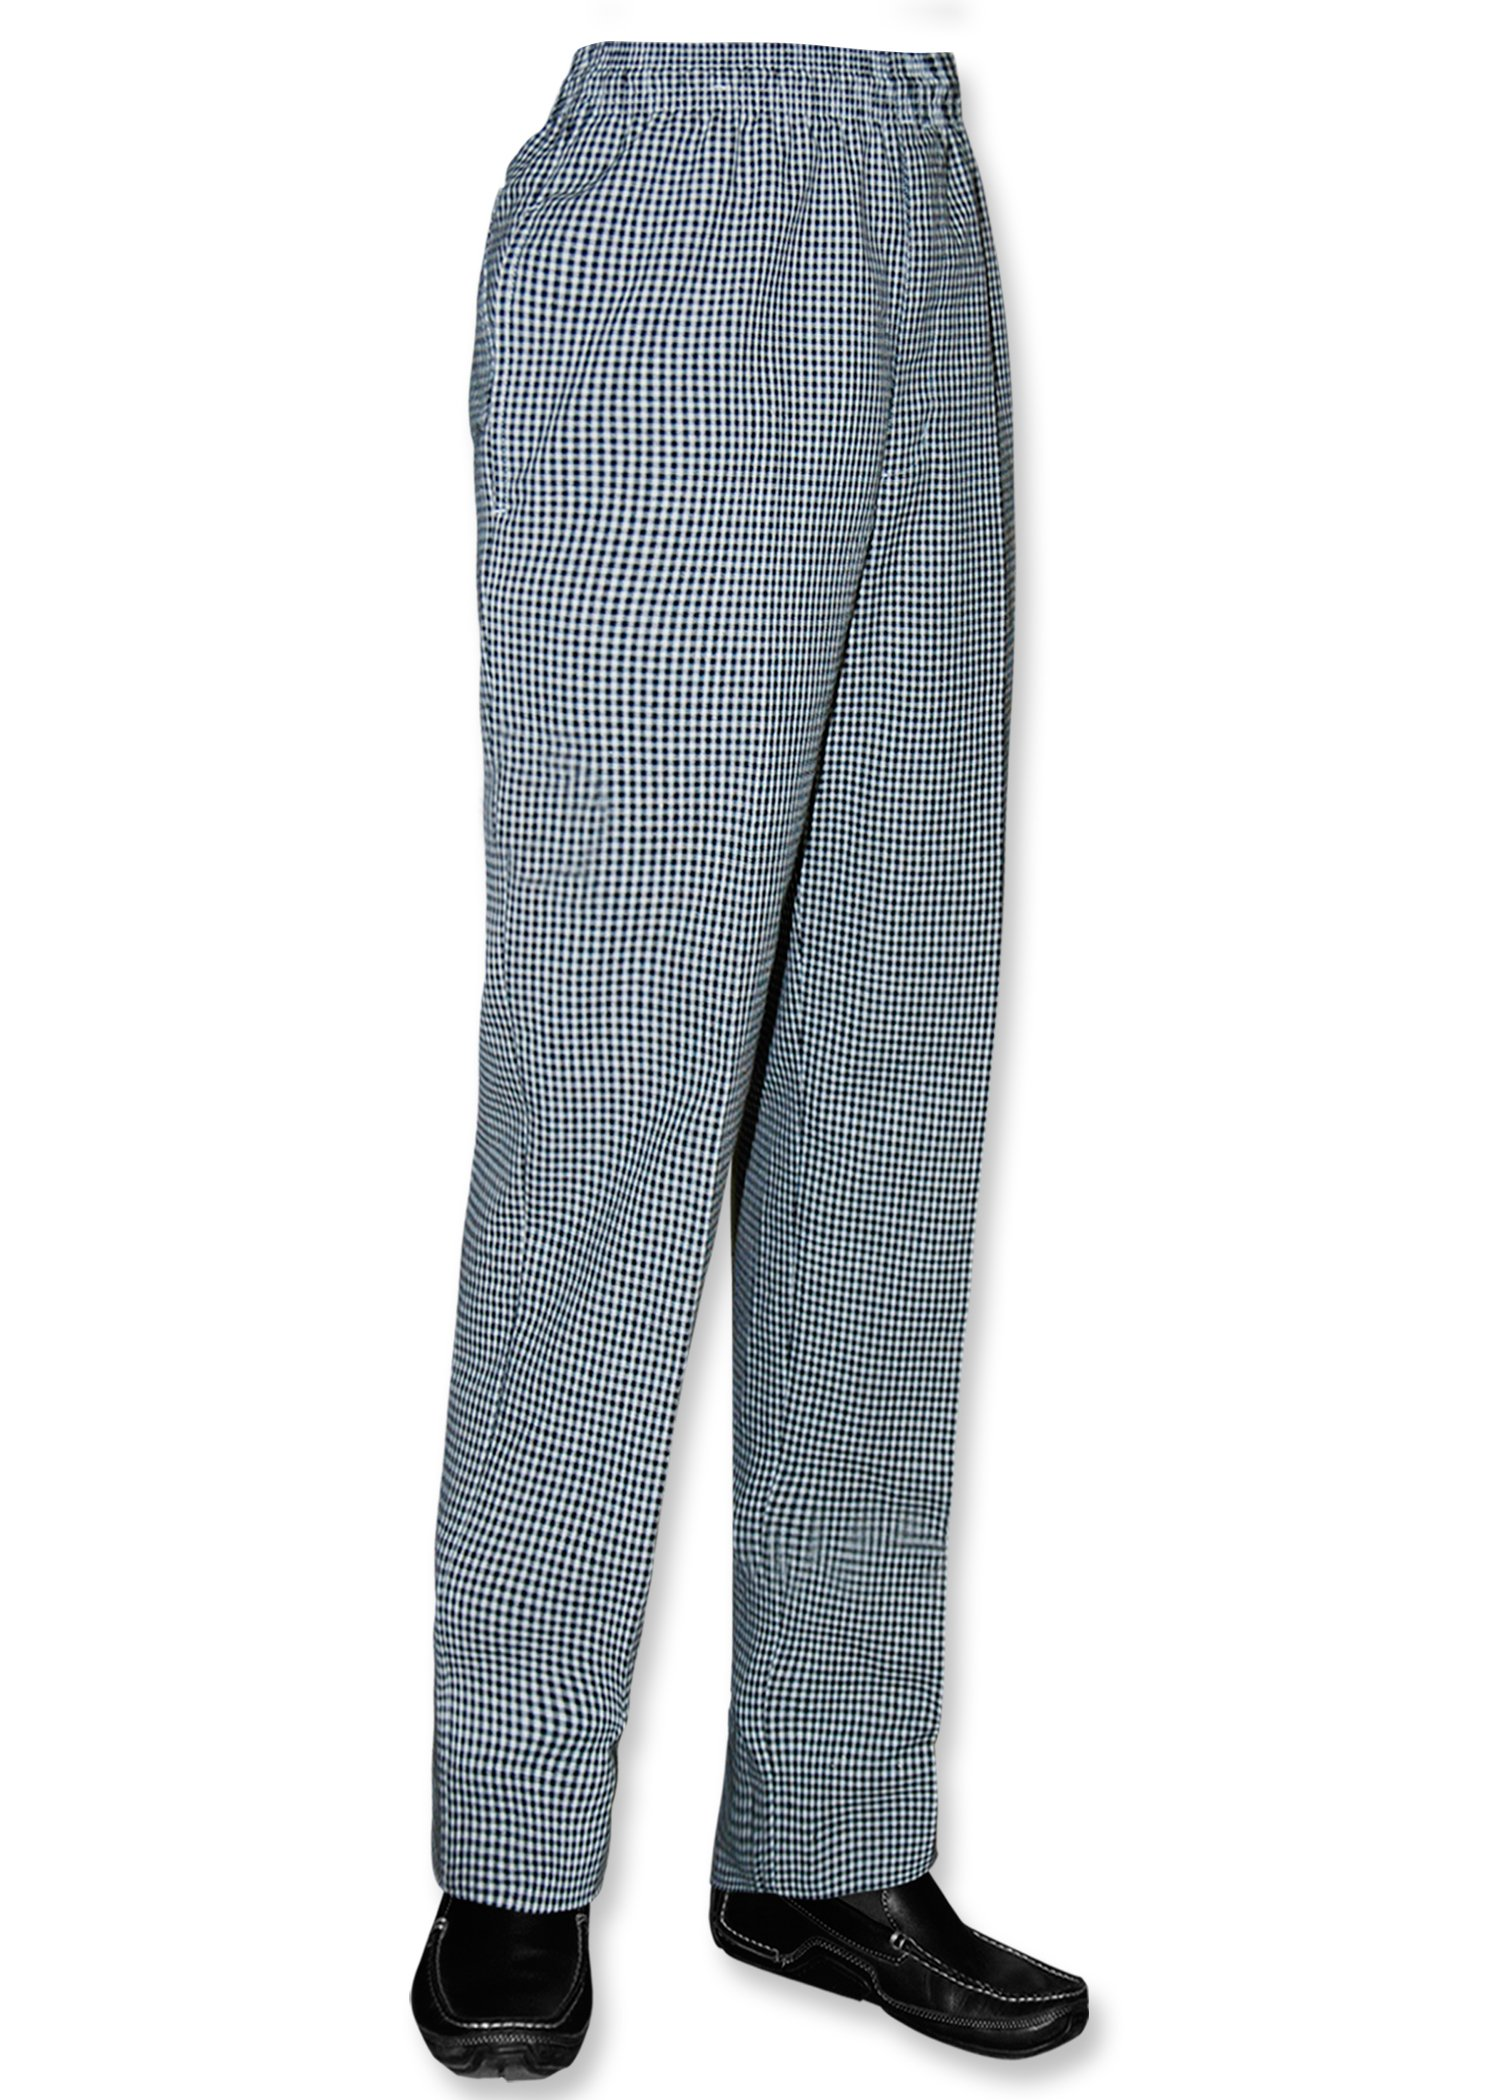 Newchef Fashion Black & White Woven Checkered Ladies Chef Pant M Checkered